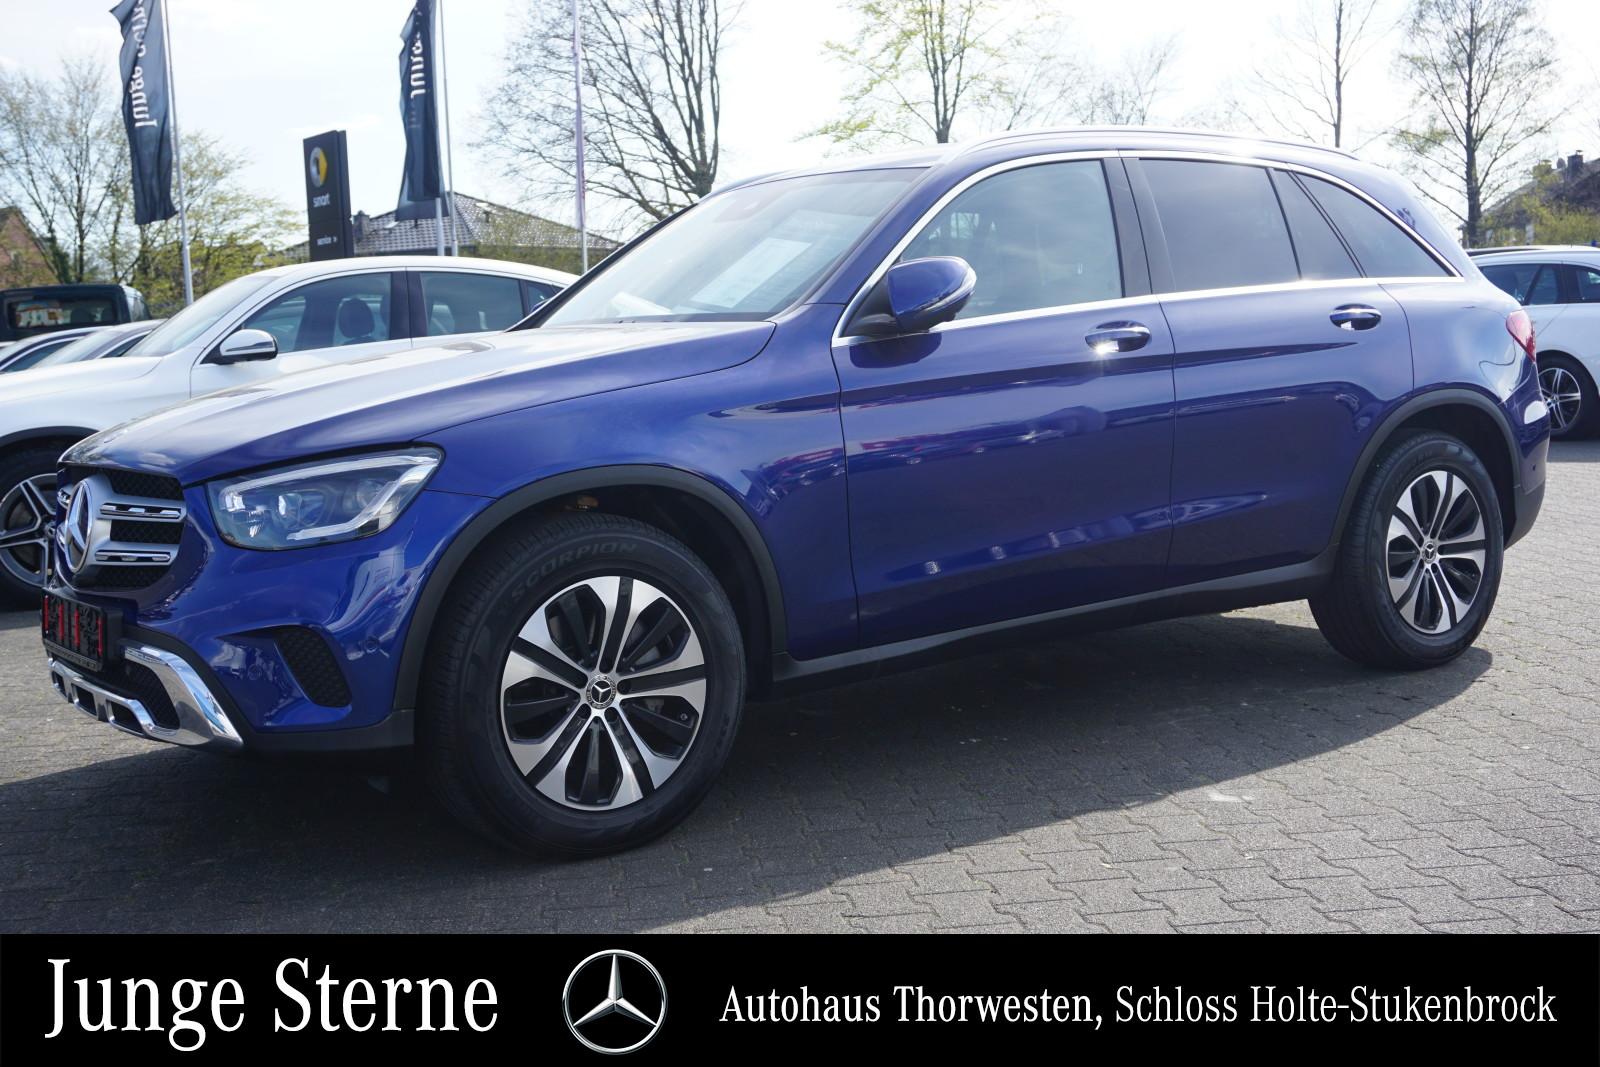 Mercedes-Benz GLC 300 d 4MATIC Distronic Widescreen AHK, Jahr 2019, Diesel